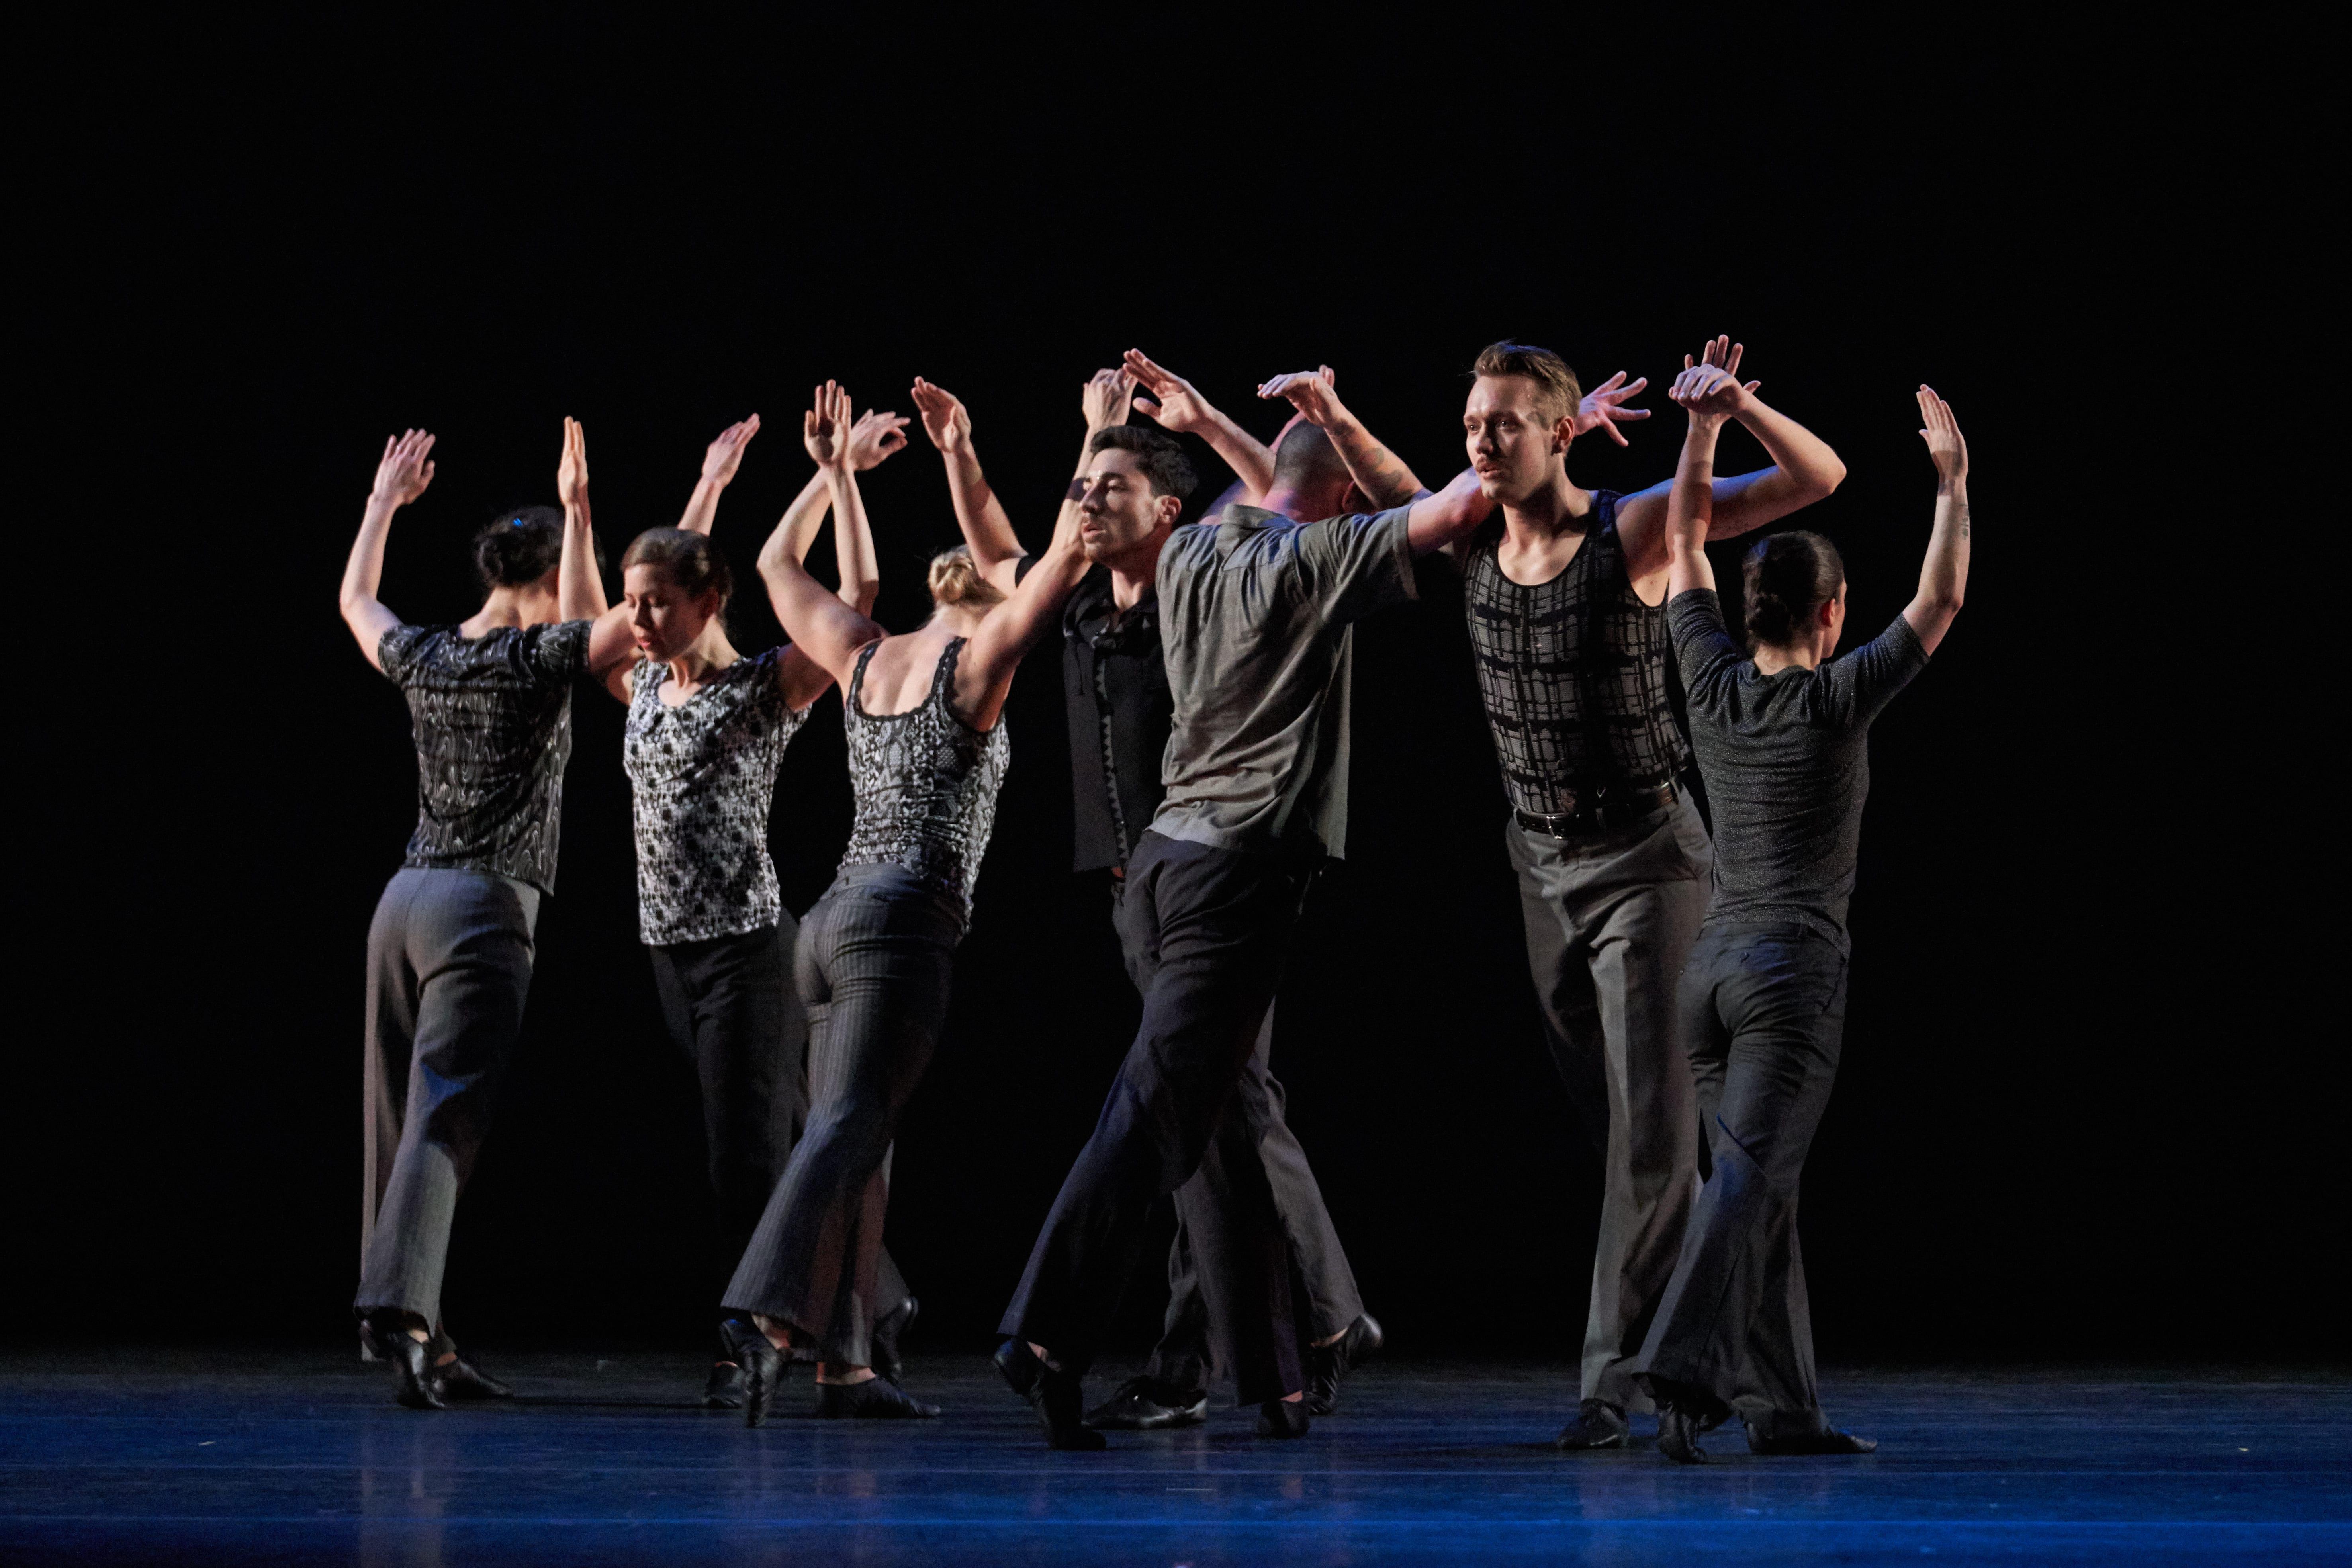 THE FACTS \u2013 The Dances \u2013 The Music | Classic Jazz Dance \u2013 The Work of Danny Buraczeski and JAZZDANCE